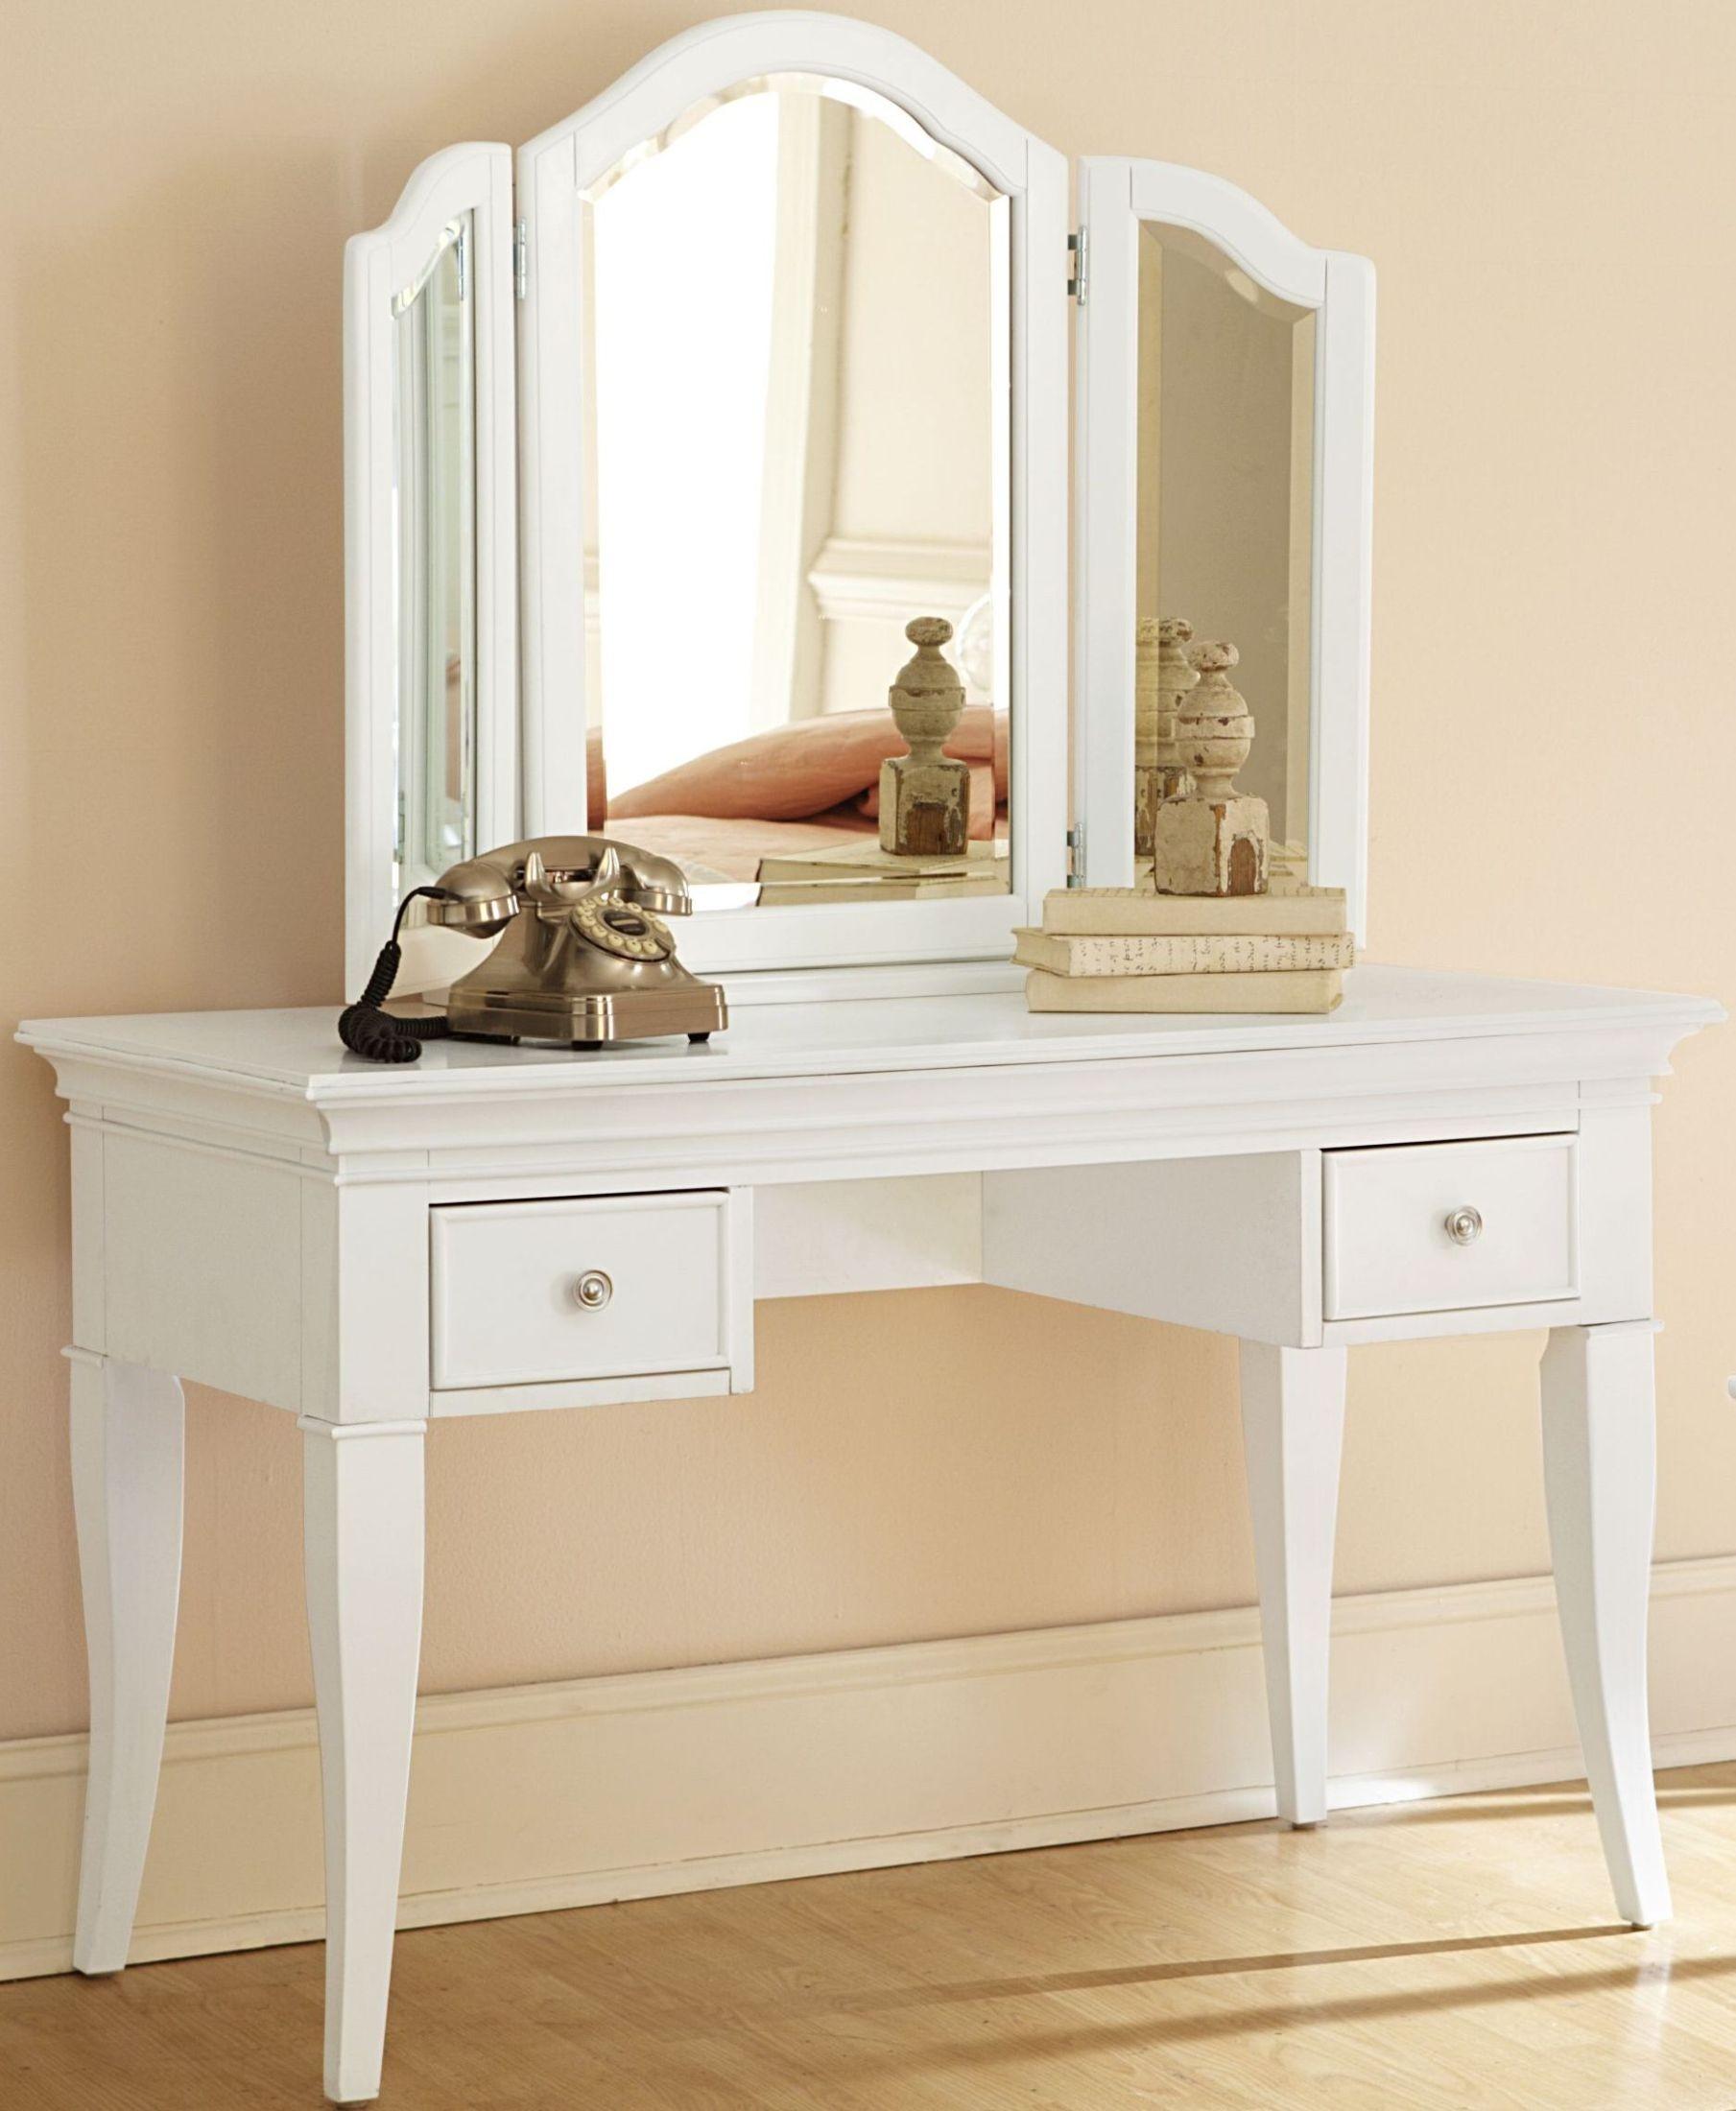 walnut street white desk and storage vanity with mirror 8540ndv ne kids. Black Bedroom Furniture Sets. Home Design Ideas